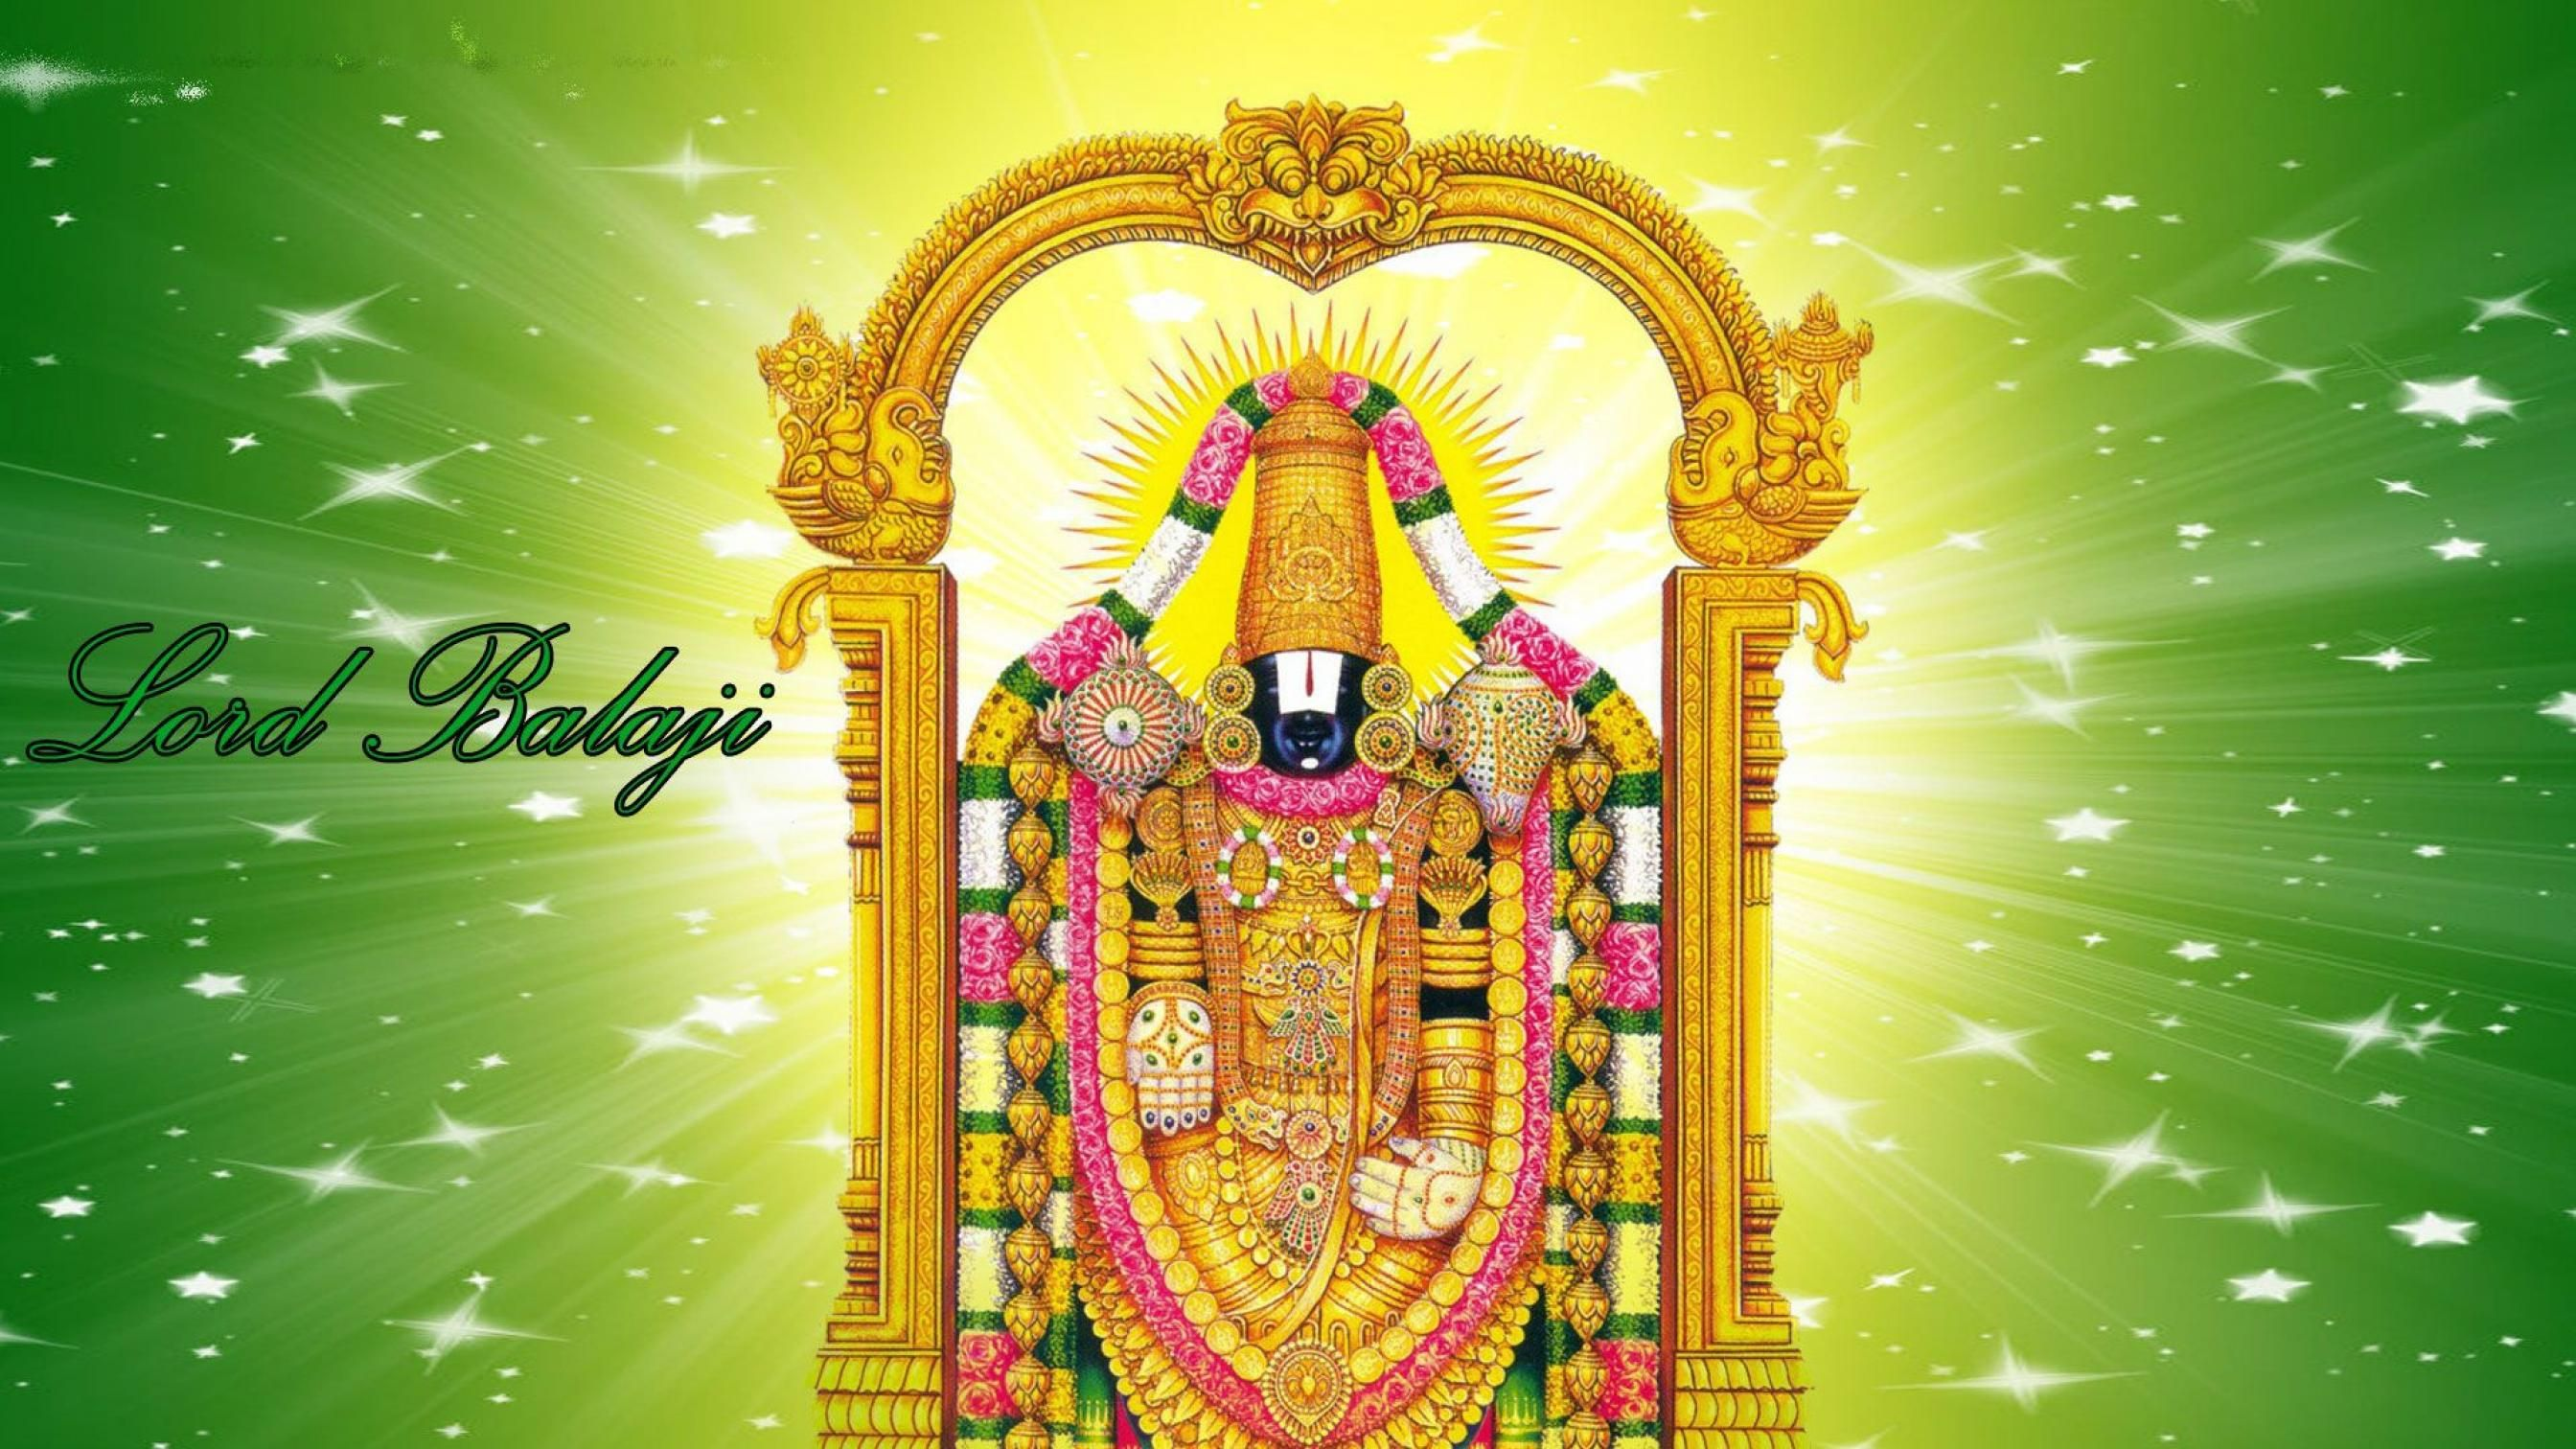 Tirupati Balaji Photos Hd Wallpaper 1080p Wallpaper Free Hd Wallpapers Balaji images hd wallpaper free download